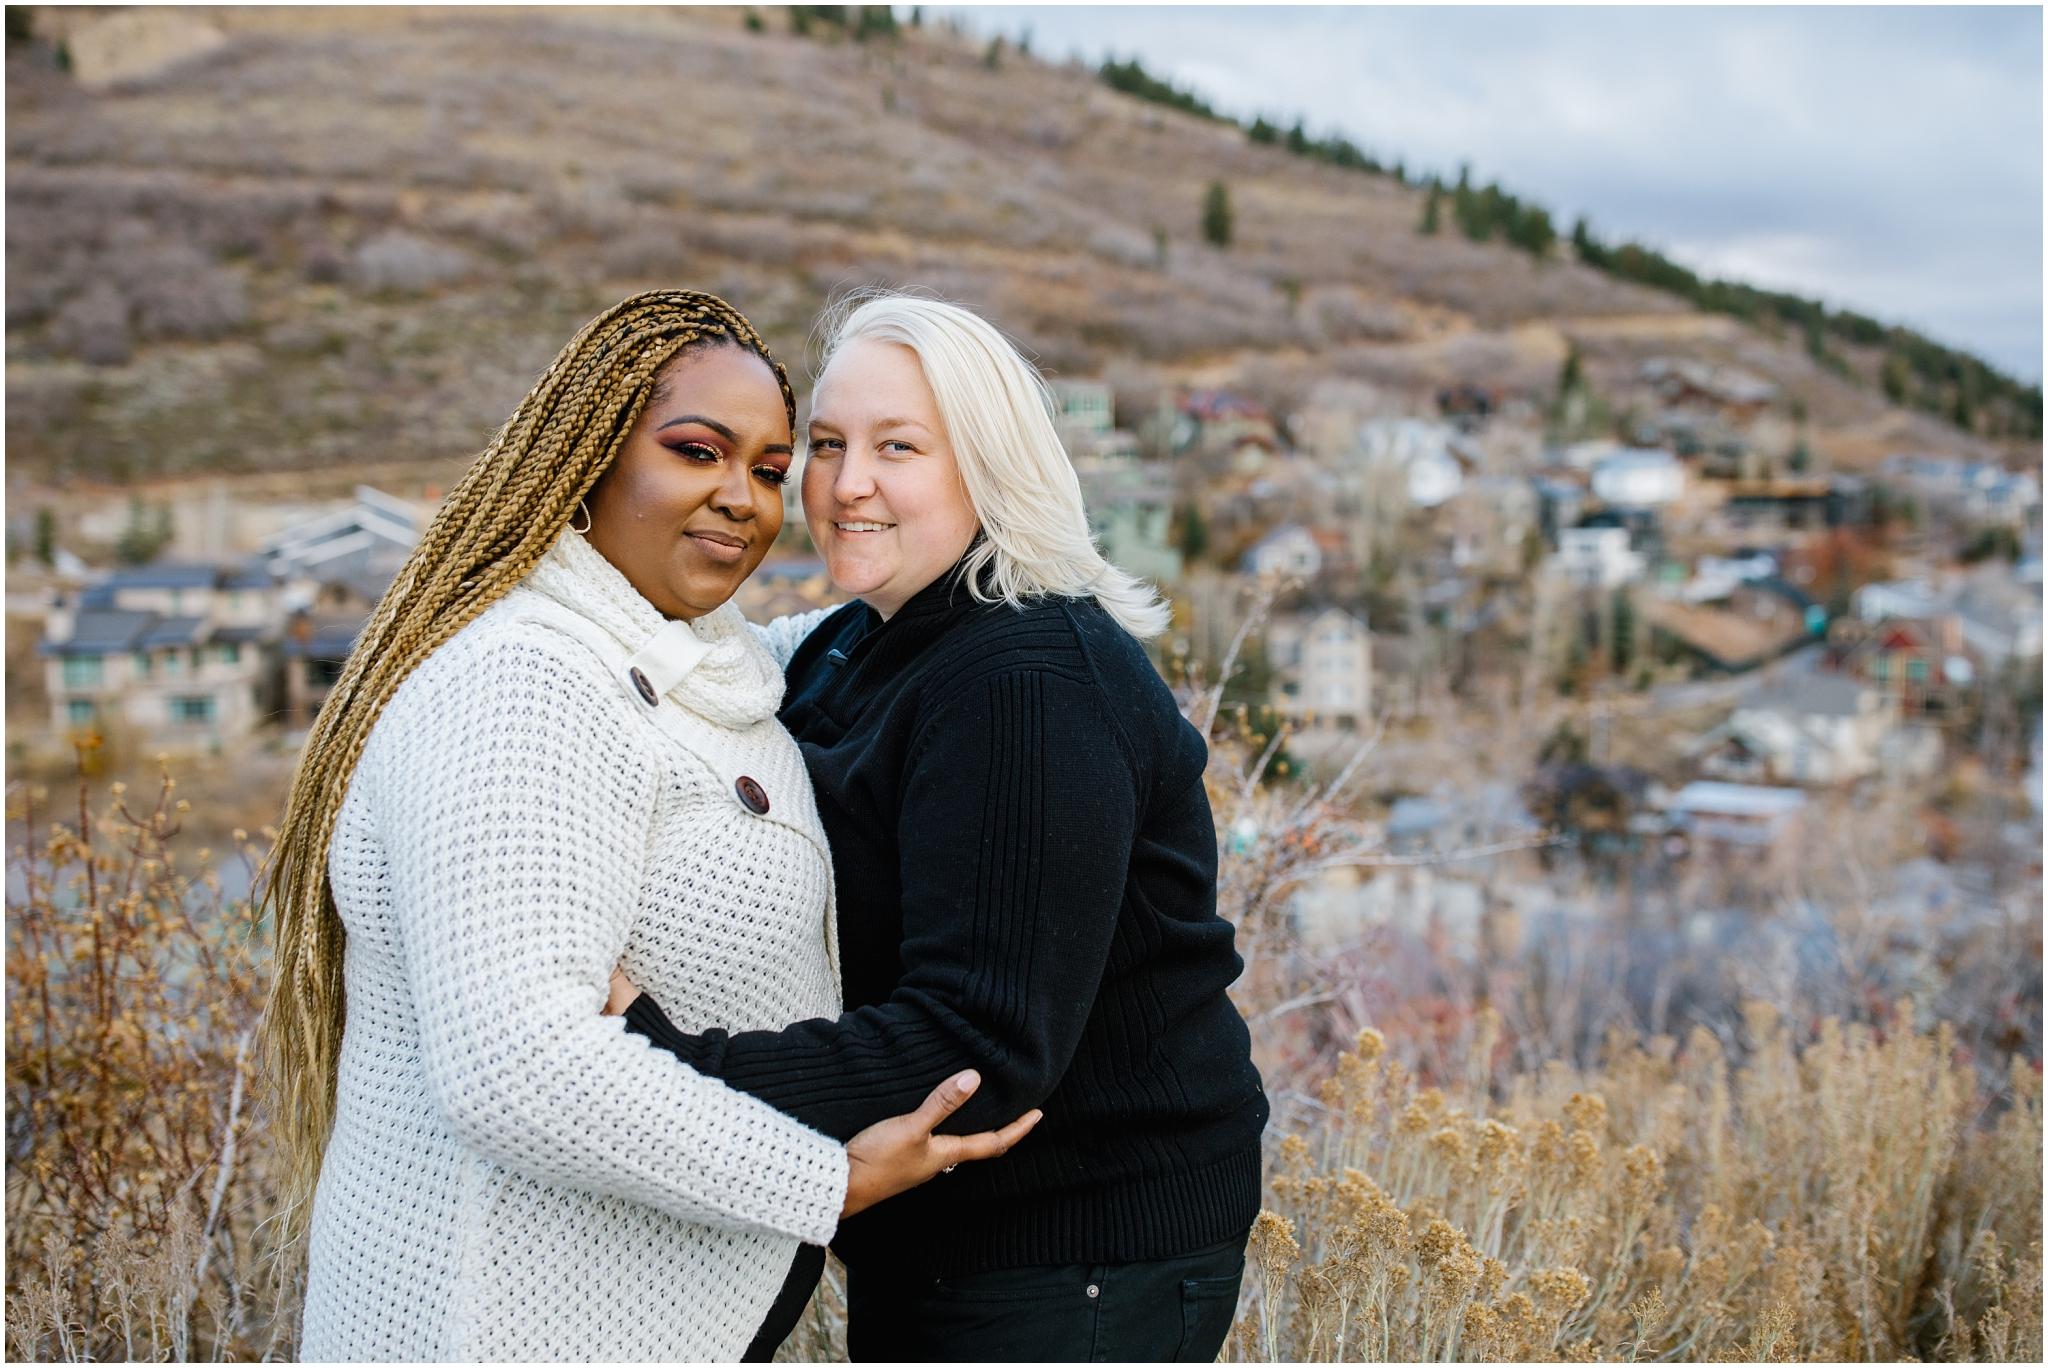 LisaTiffany2018-147_Lizzie-B-Imagery-Utah-Family-Photographer-Salt-Lake-City-Park-City-Miners-Hospital-Community-Center.jpg